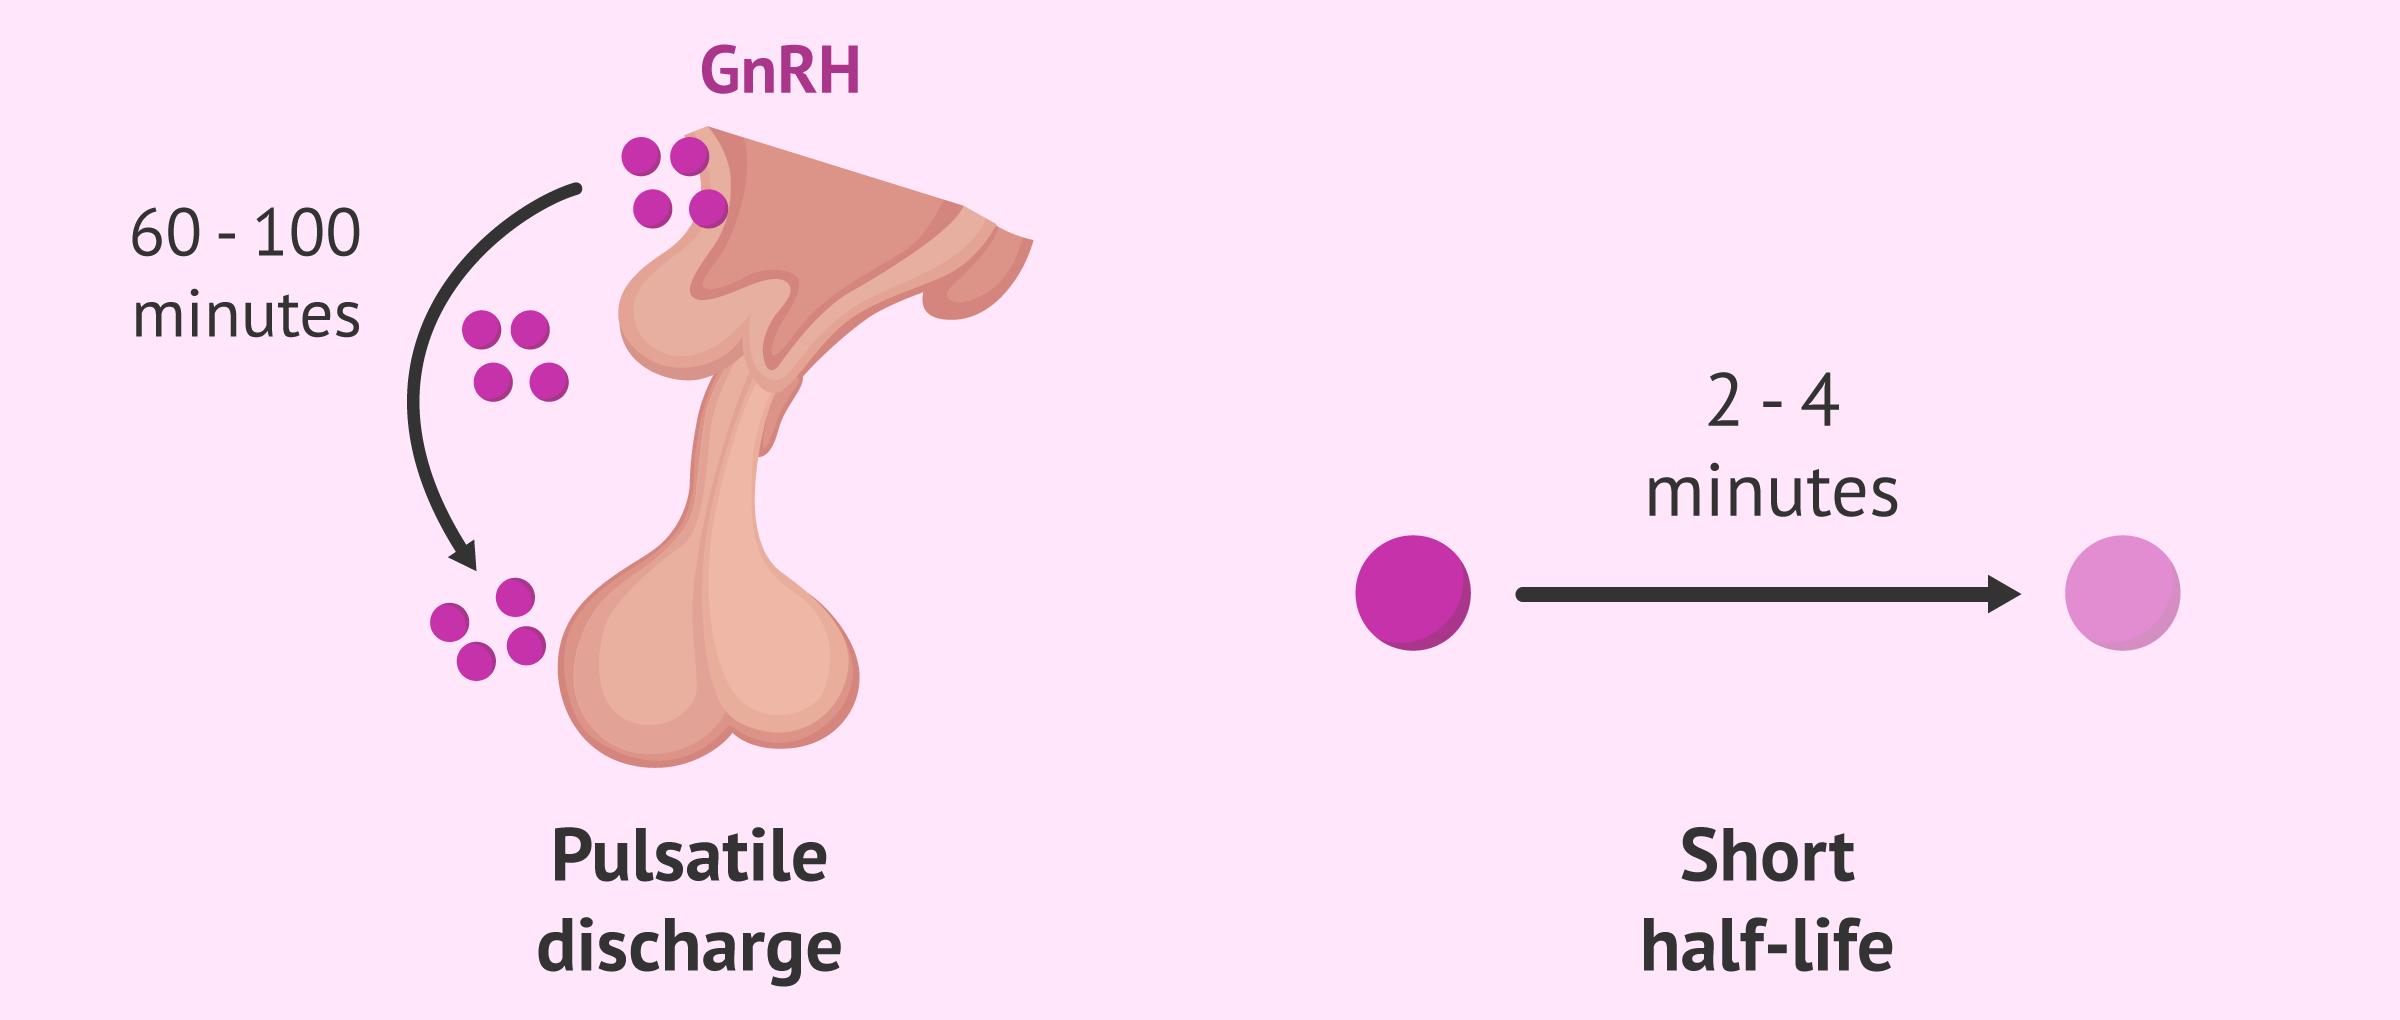 Characteristics of GnRh